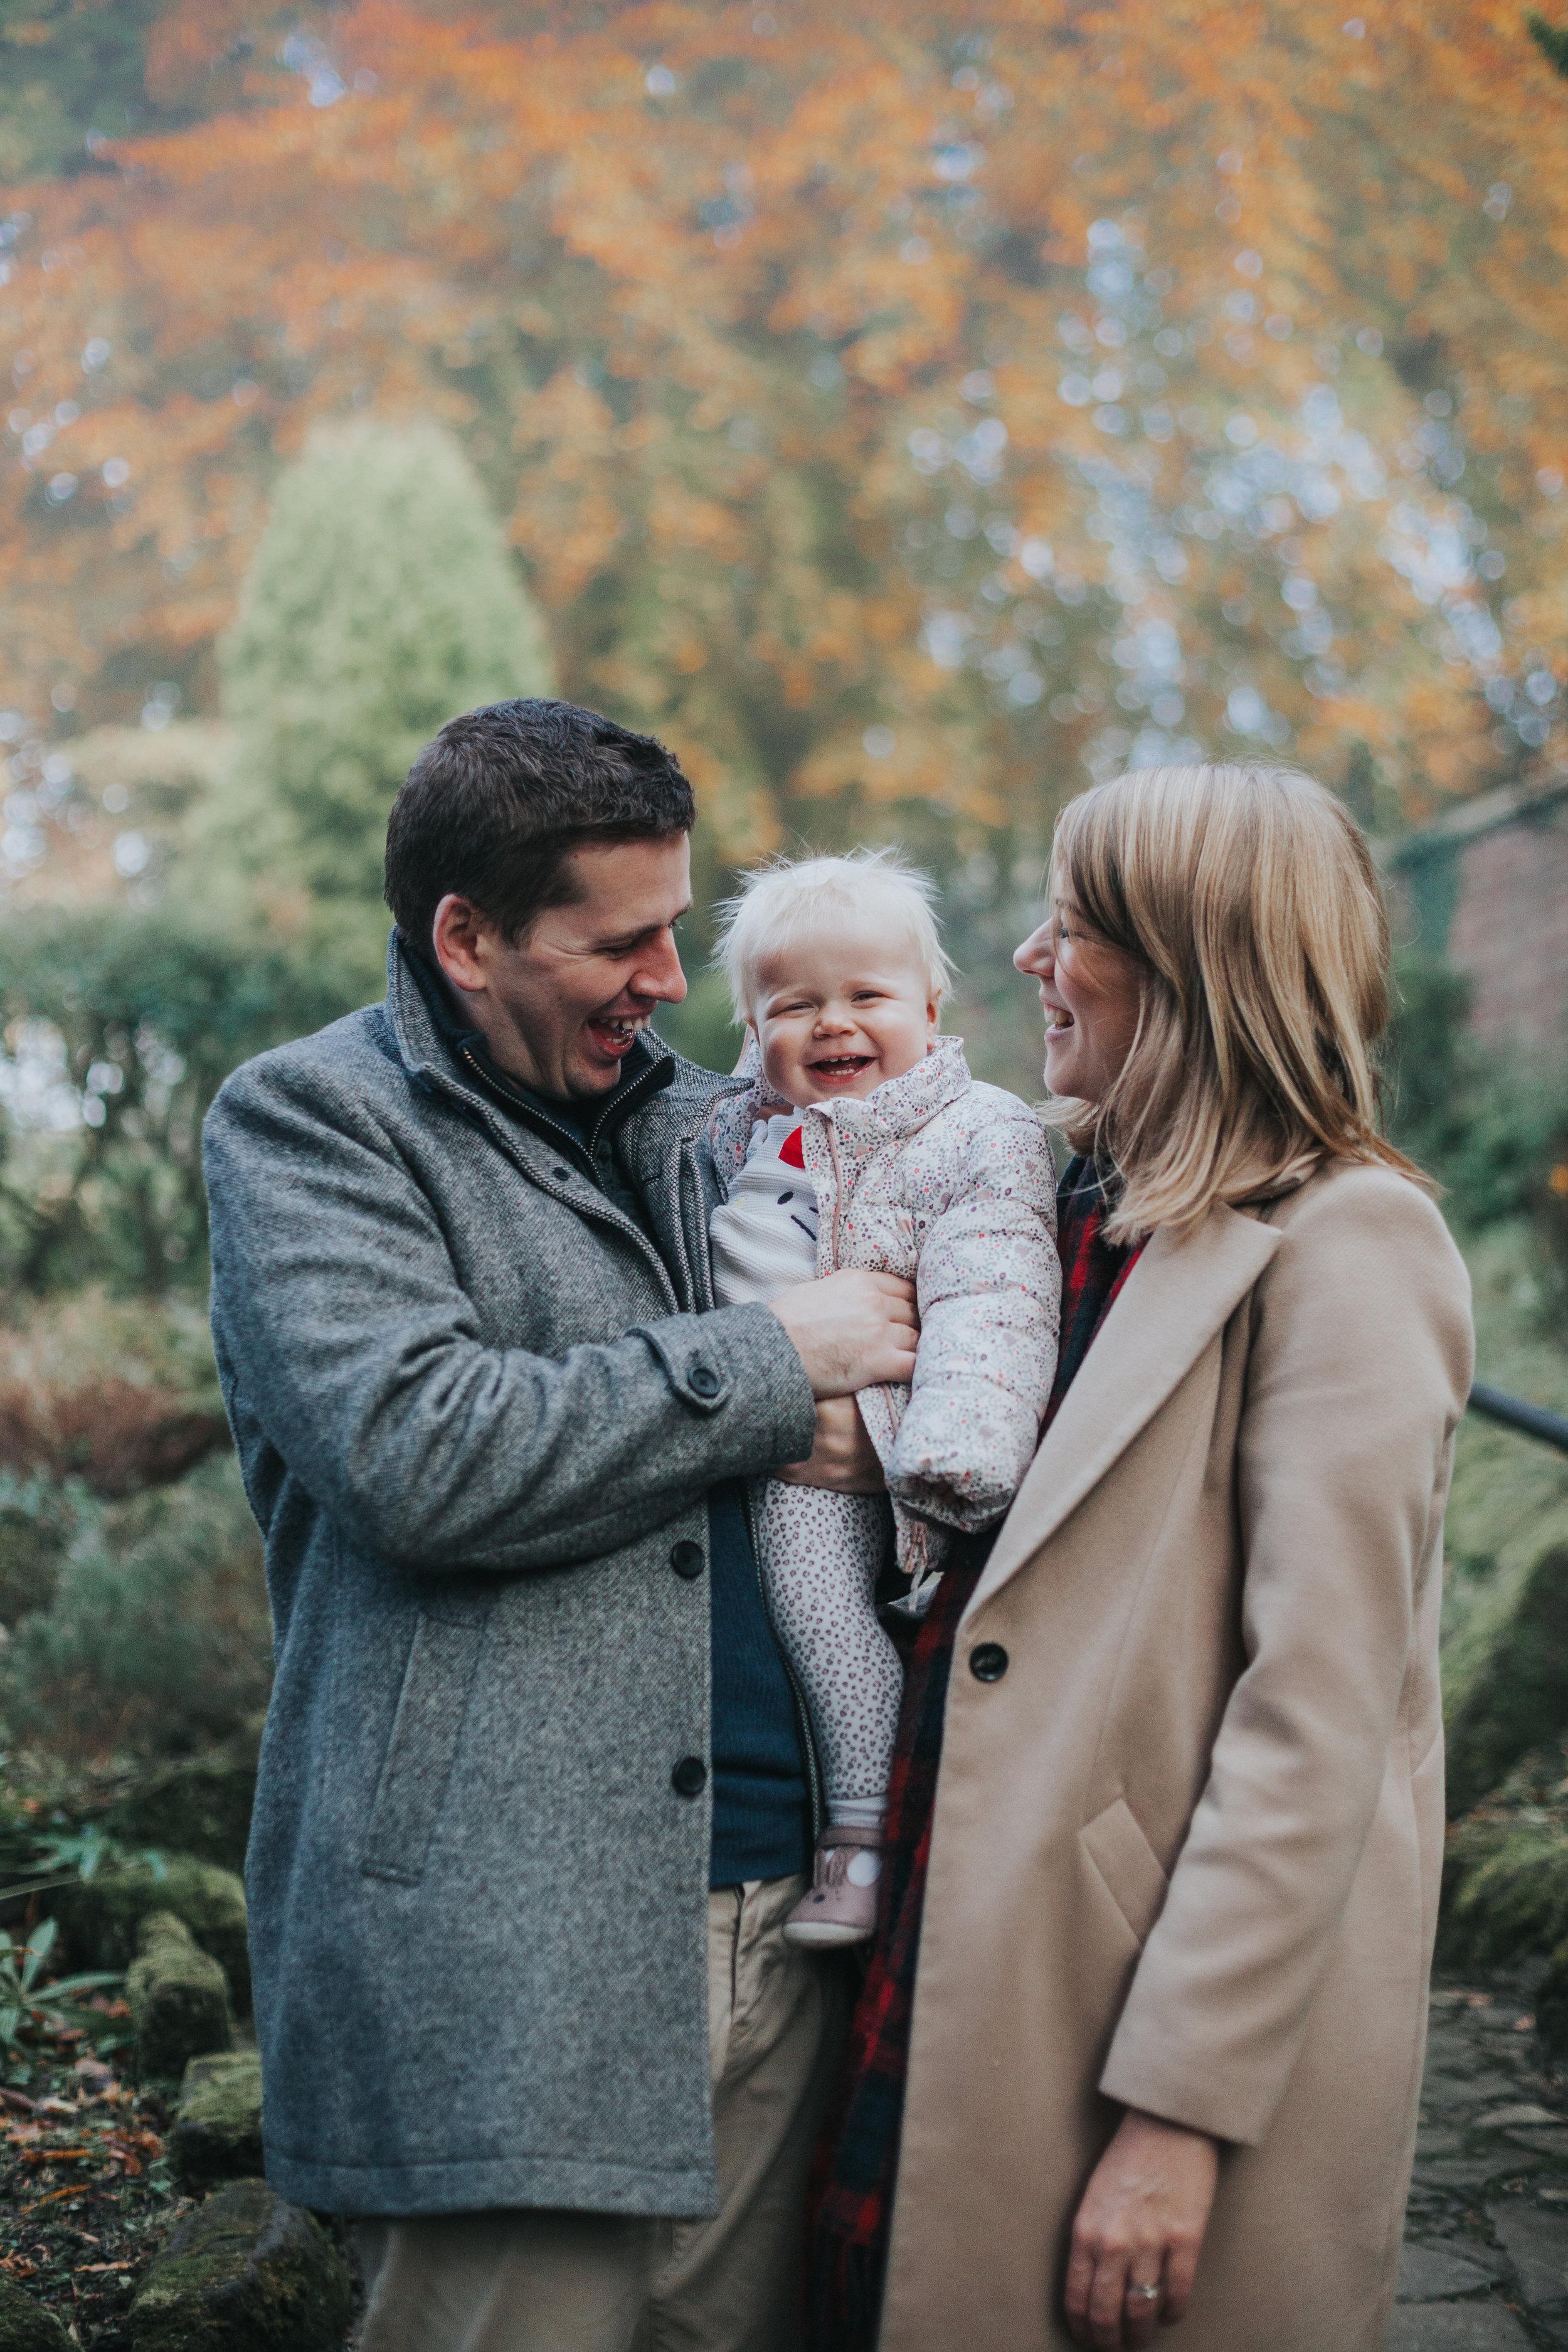 Autumnal Family Portrait in Park